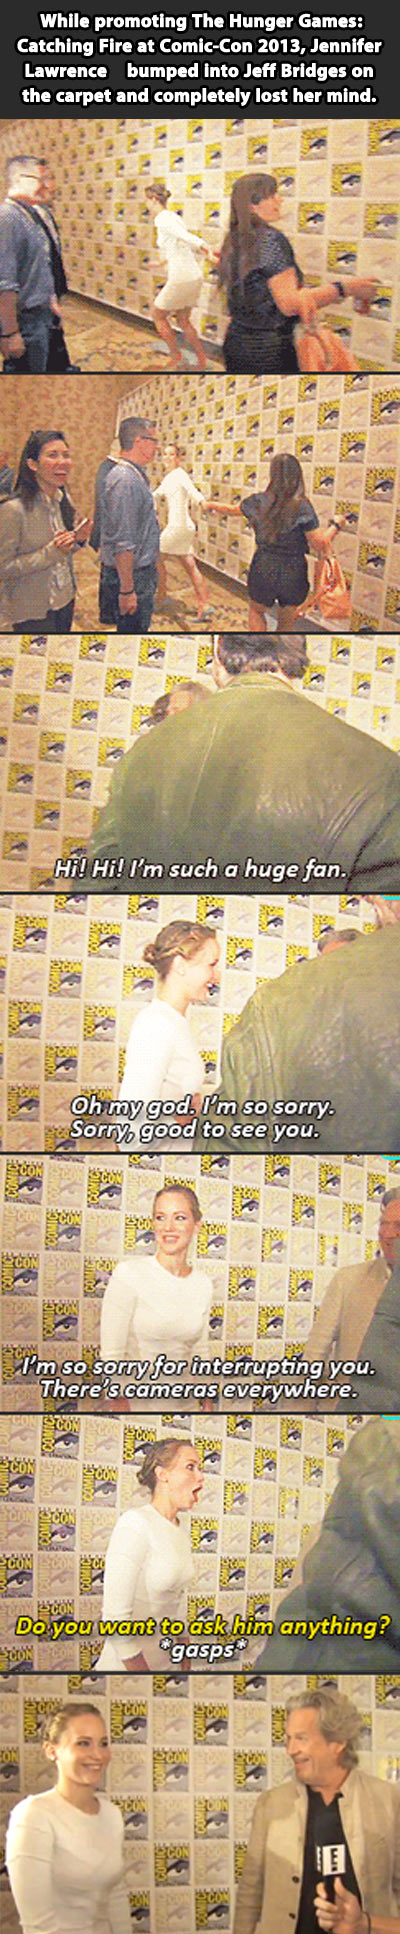 funny-Jennifer-Lawrence-meeting-Jeff-Bridges-Comic-Con